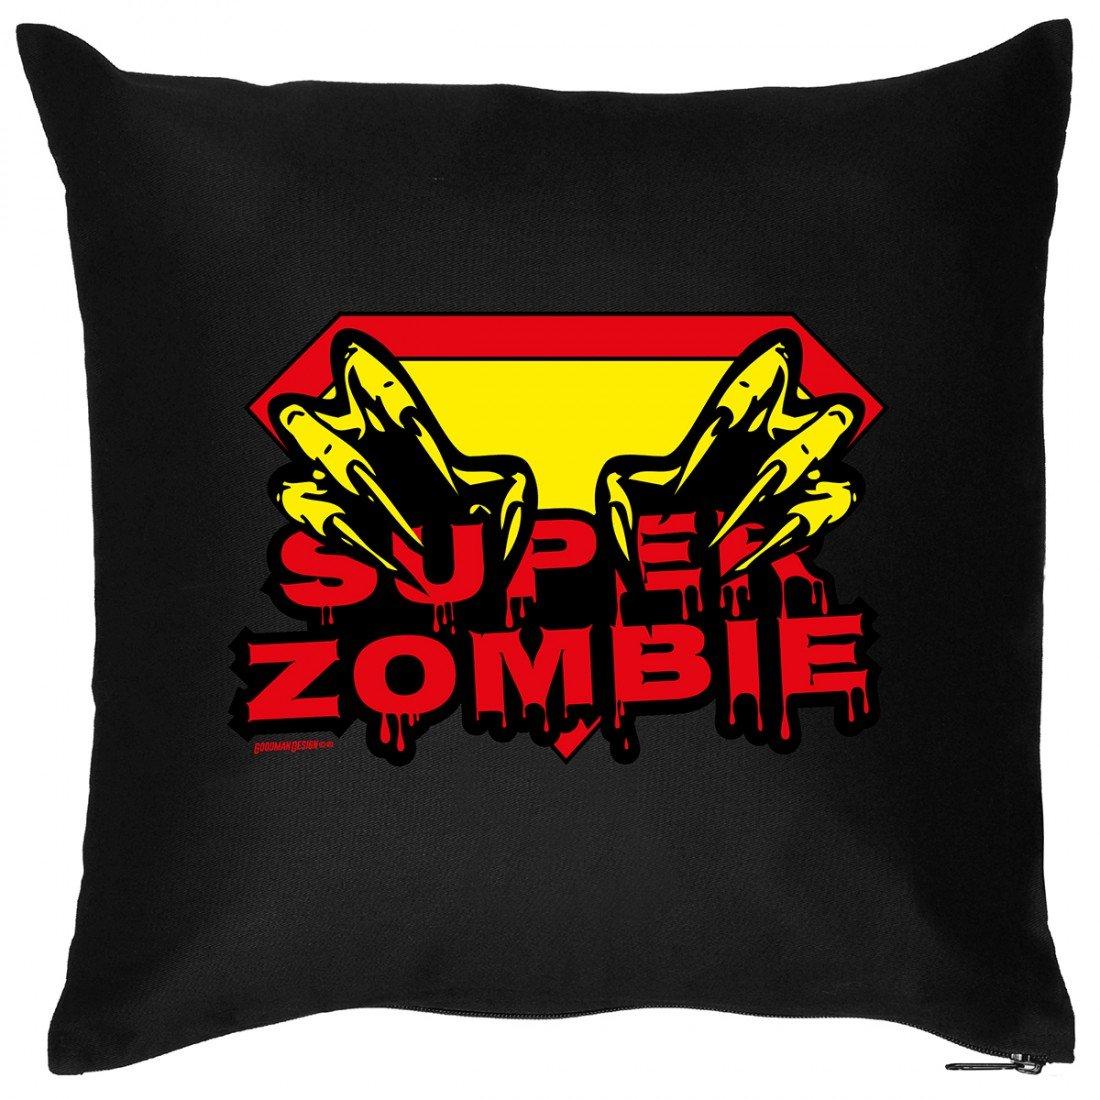 Kissen Sofakissen mit grusel Aufdruck – Super Zombie – Horror Hexe Monster Halloween Geschenk – Wendekissen jetzt bestellen